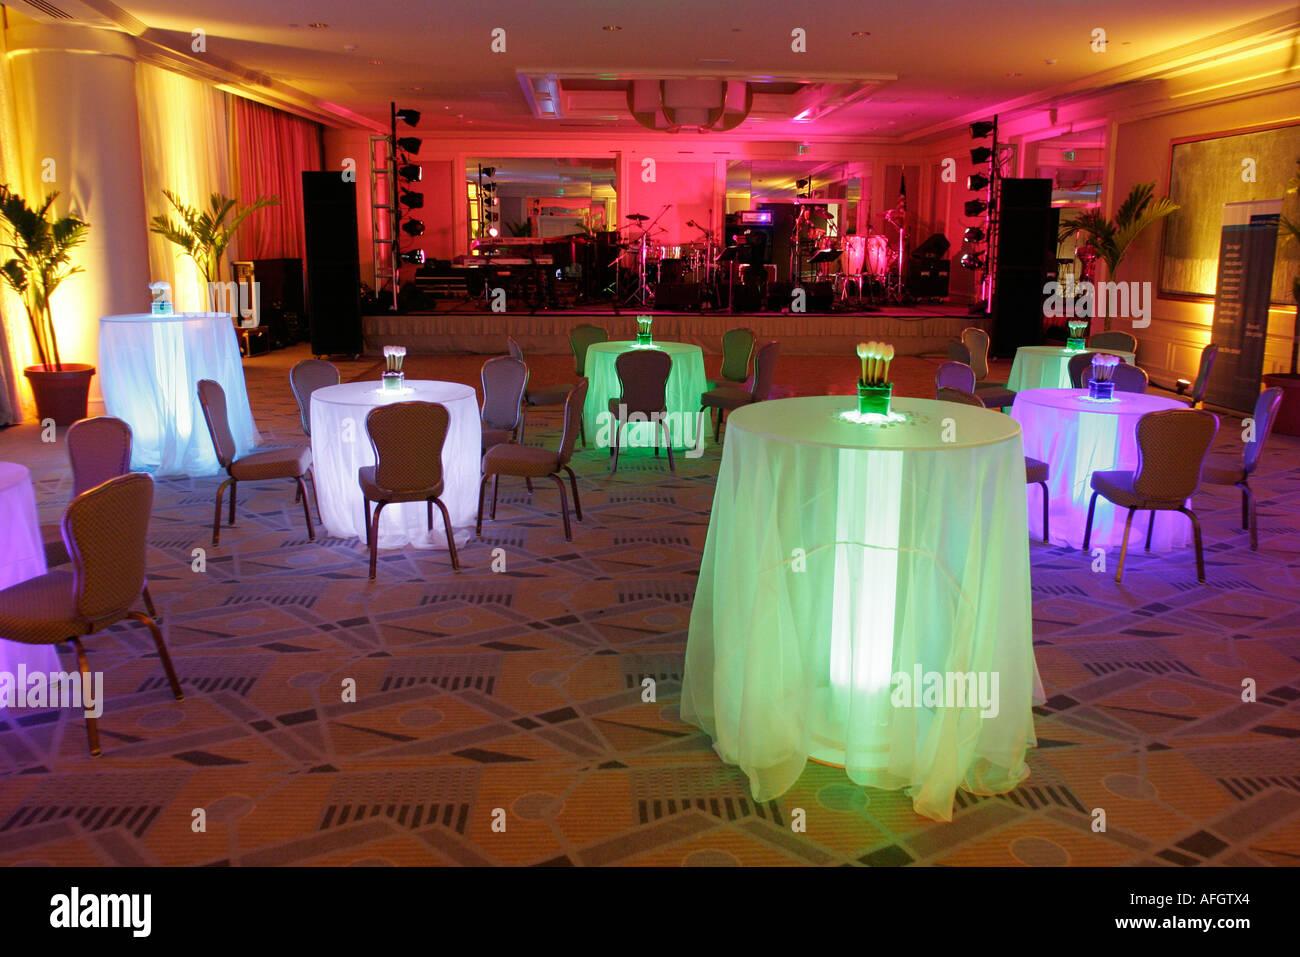 miami florida brickell avenue four seasons hotel ballroom party